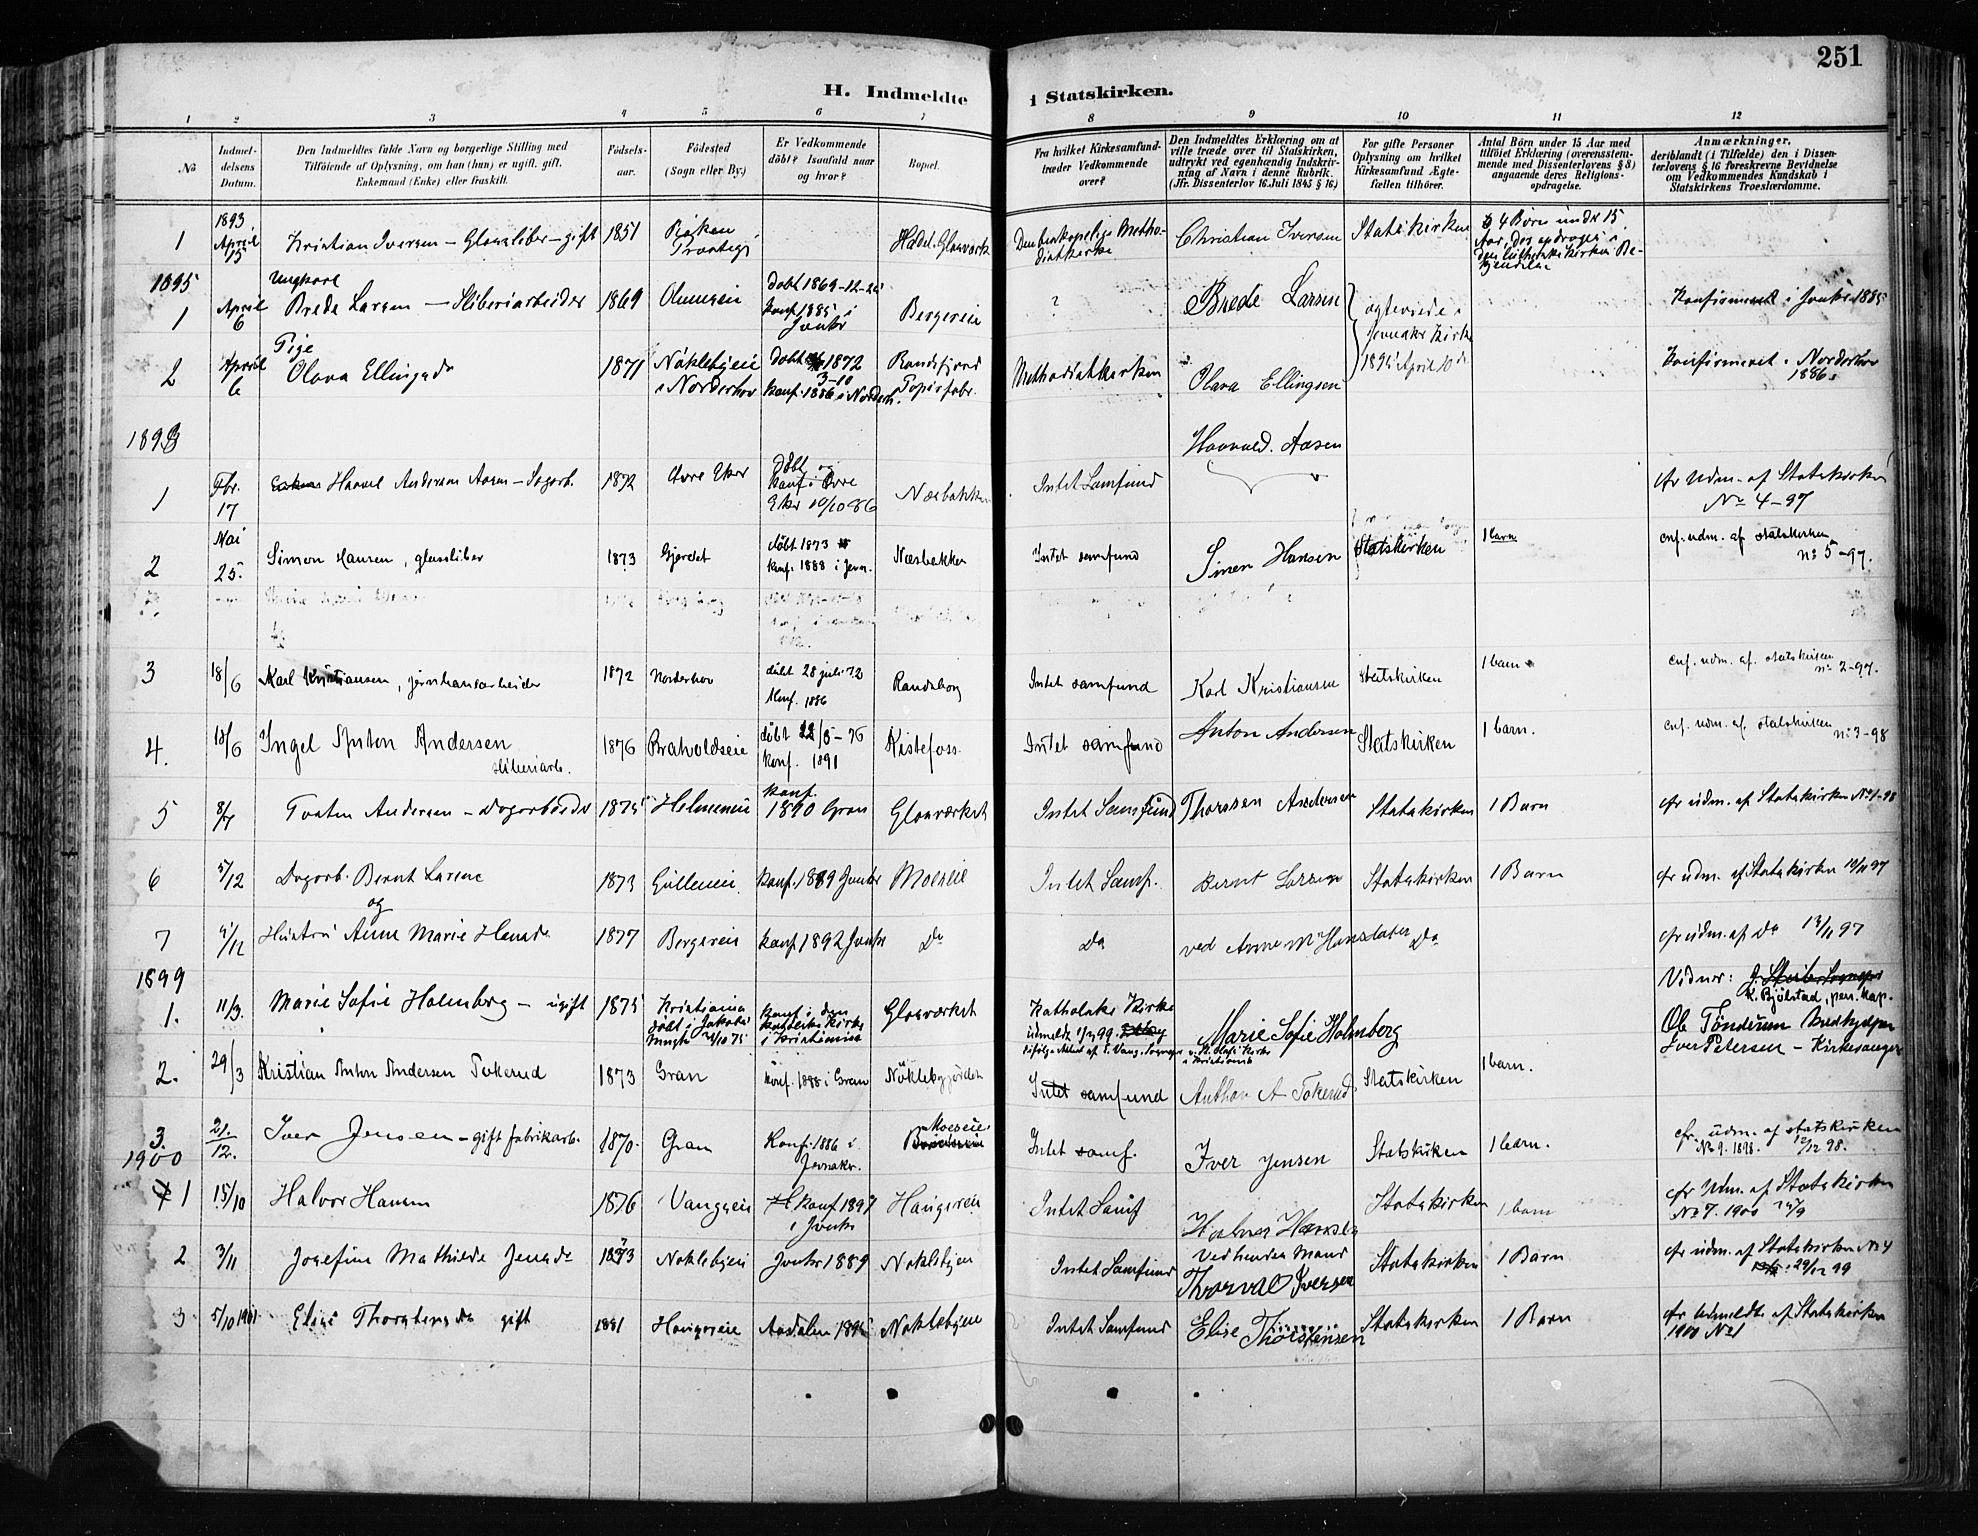 SAH, Jevnaker prestekontor, Ministerialbok nr. 9, 1891-1901, s. 251